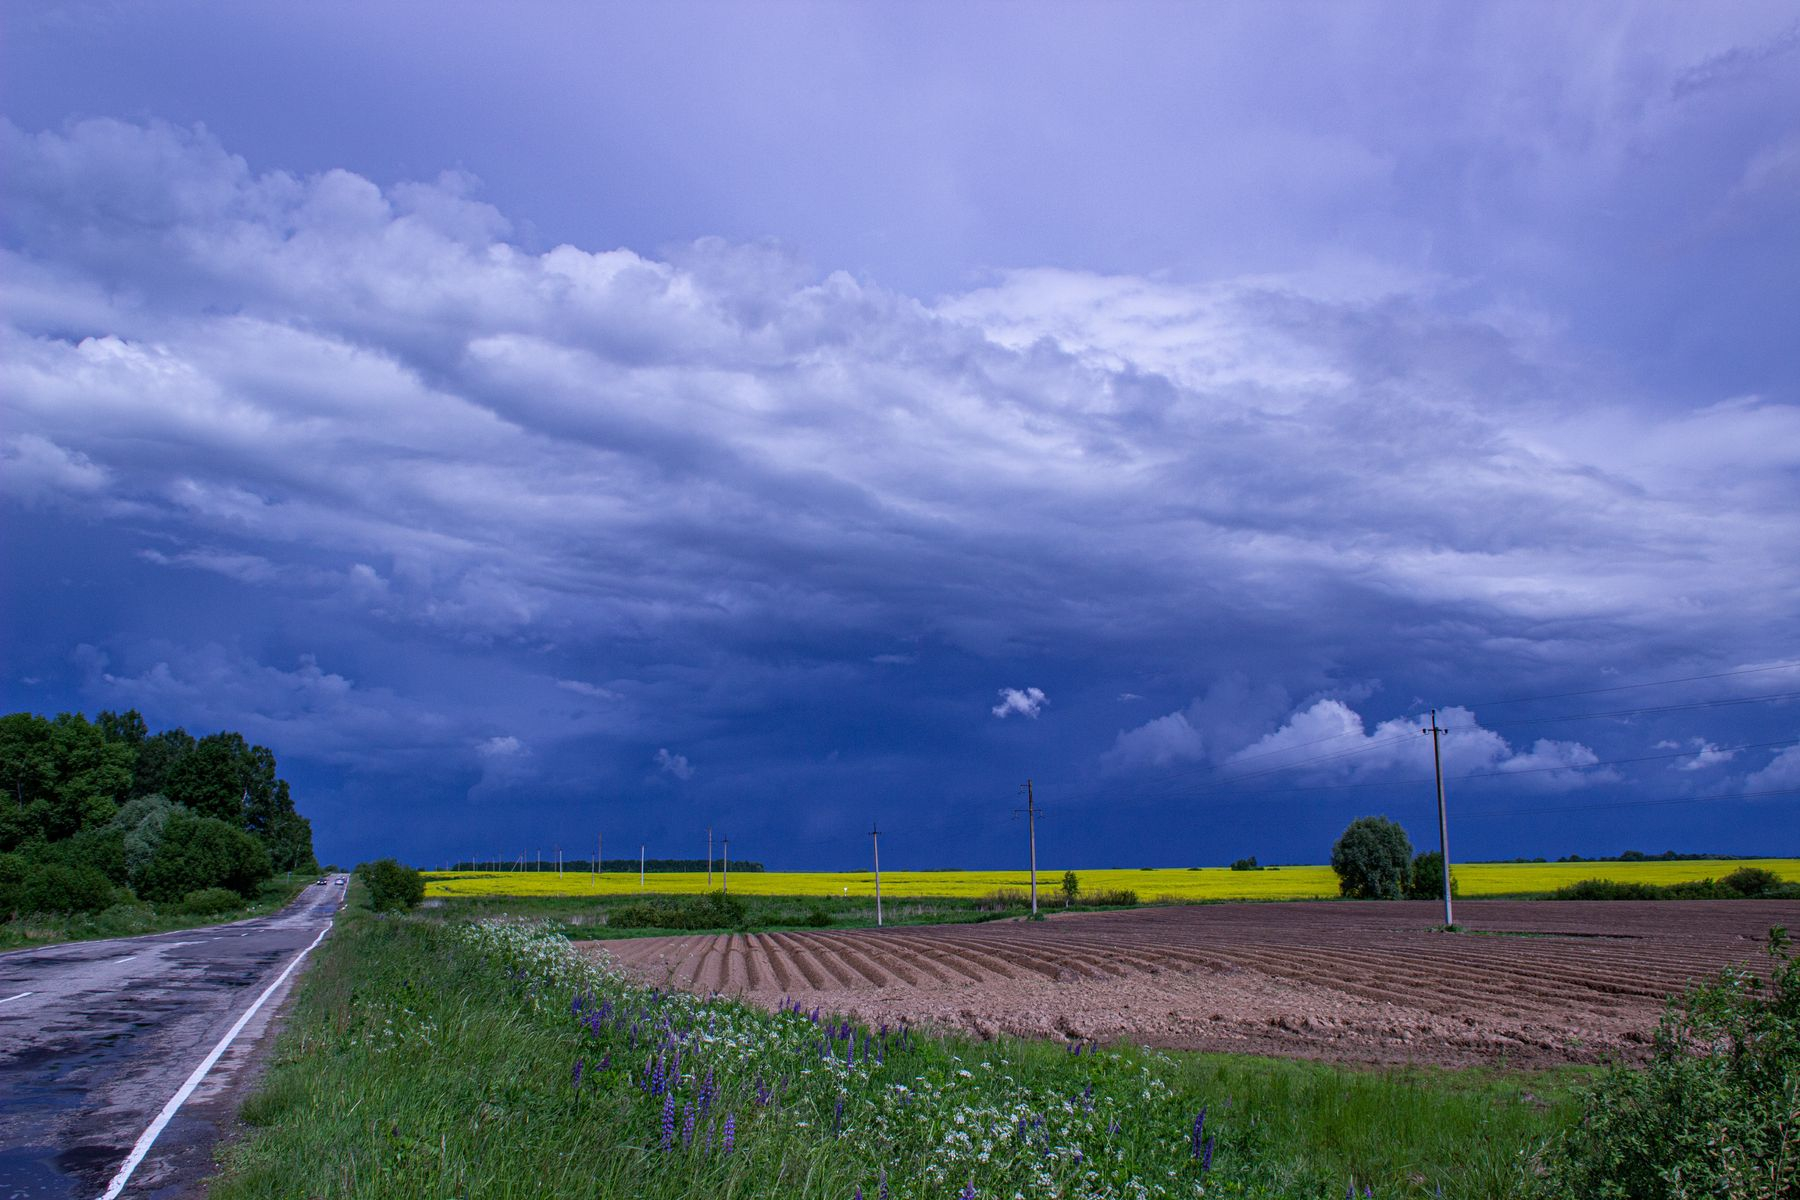 Гроза приближается поле горчица туча гроза дорога